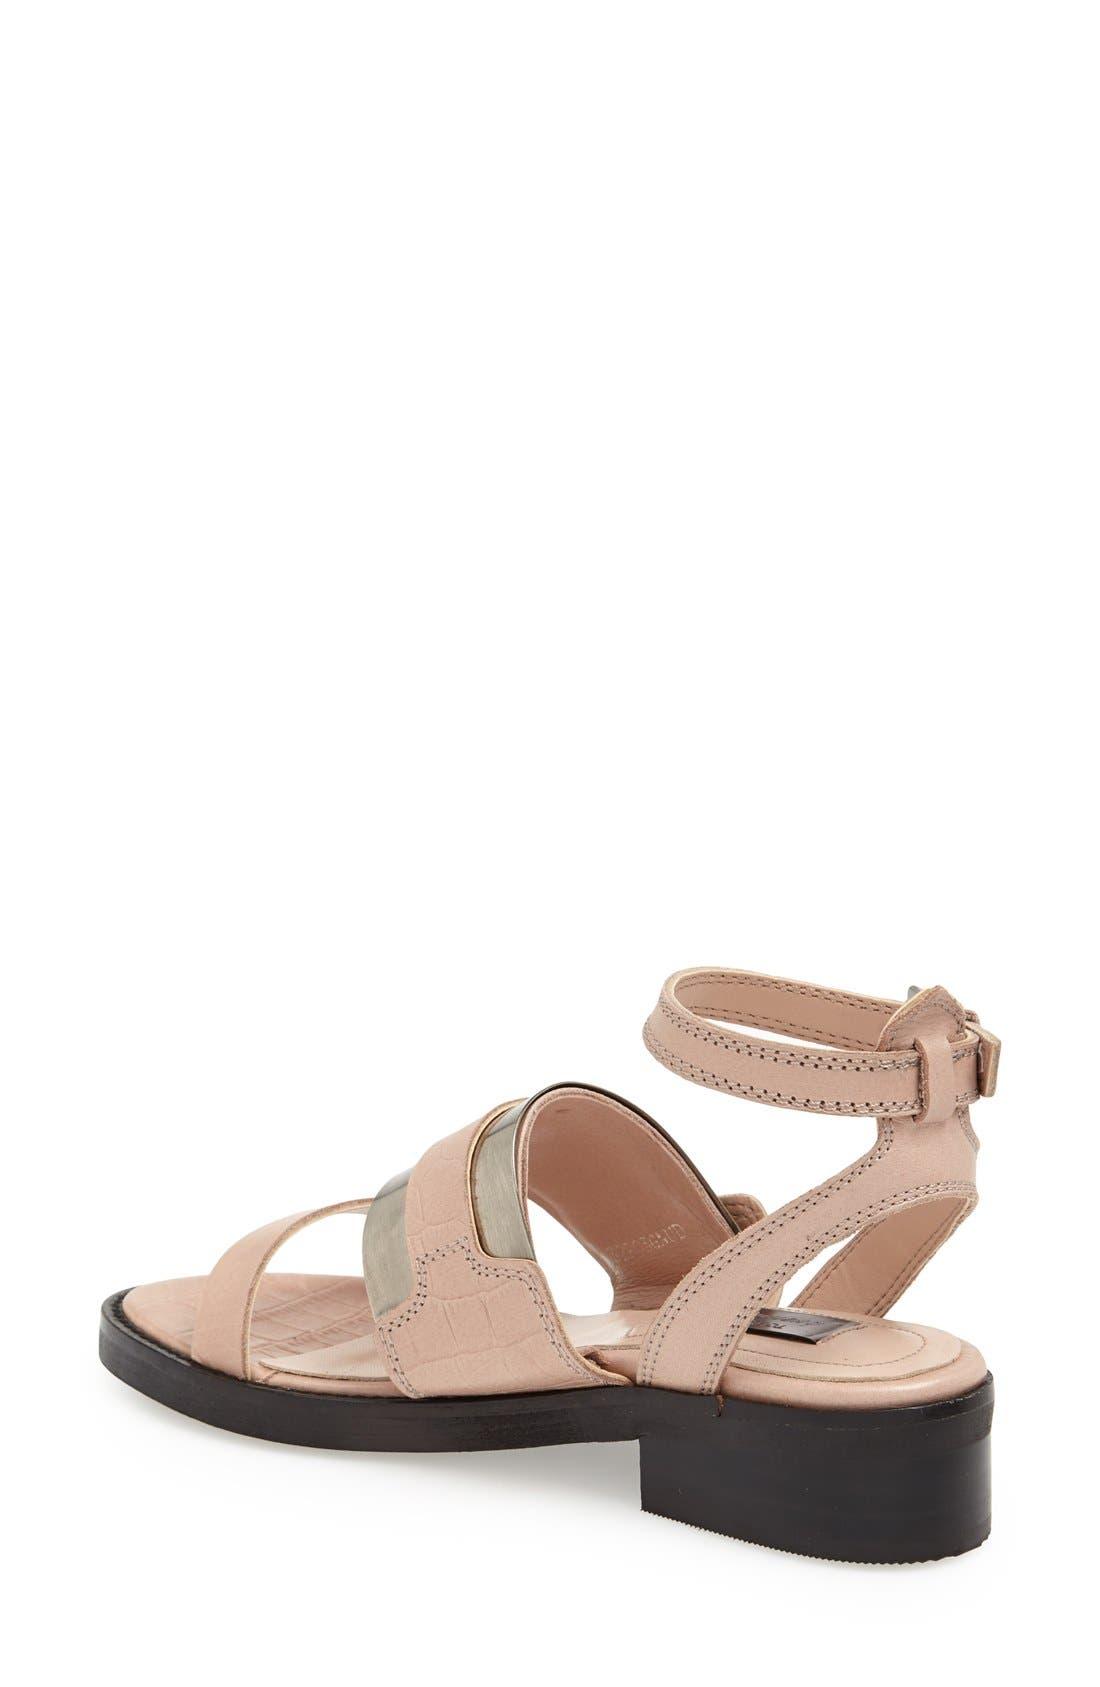 Alternate Image 2  - Topshop 'Premium - Preeta' Ankle Strap Sandal (Women)